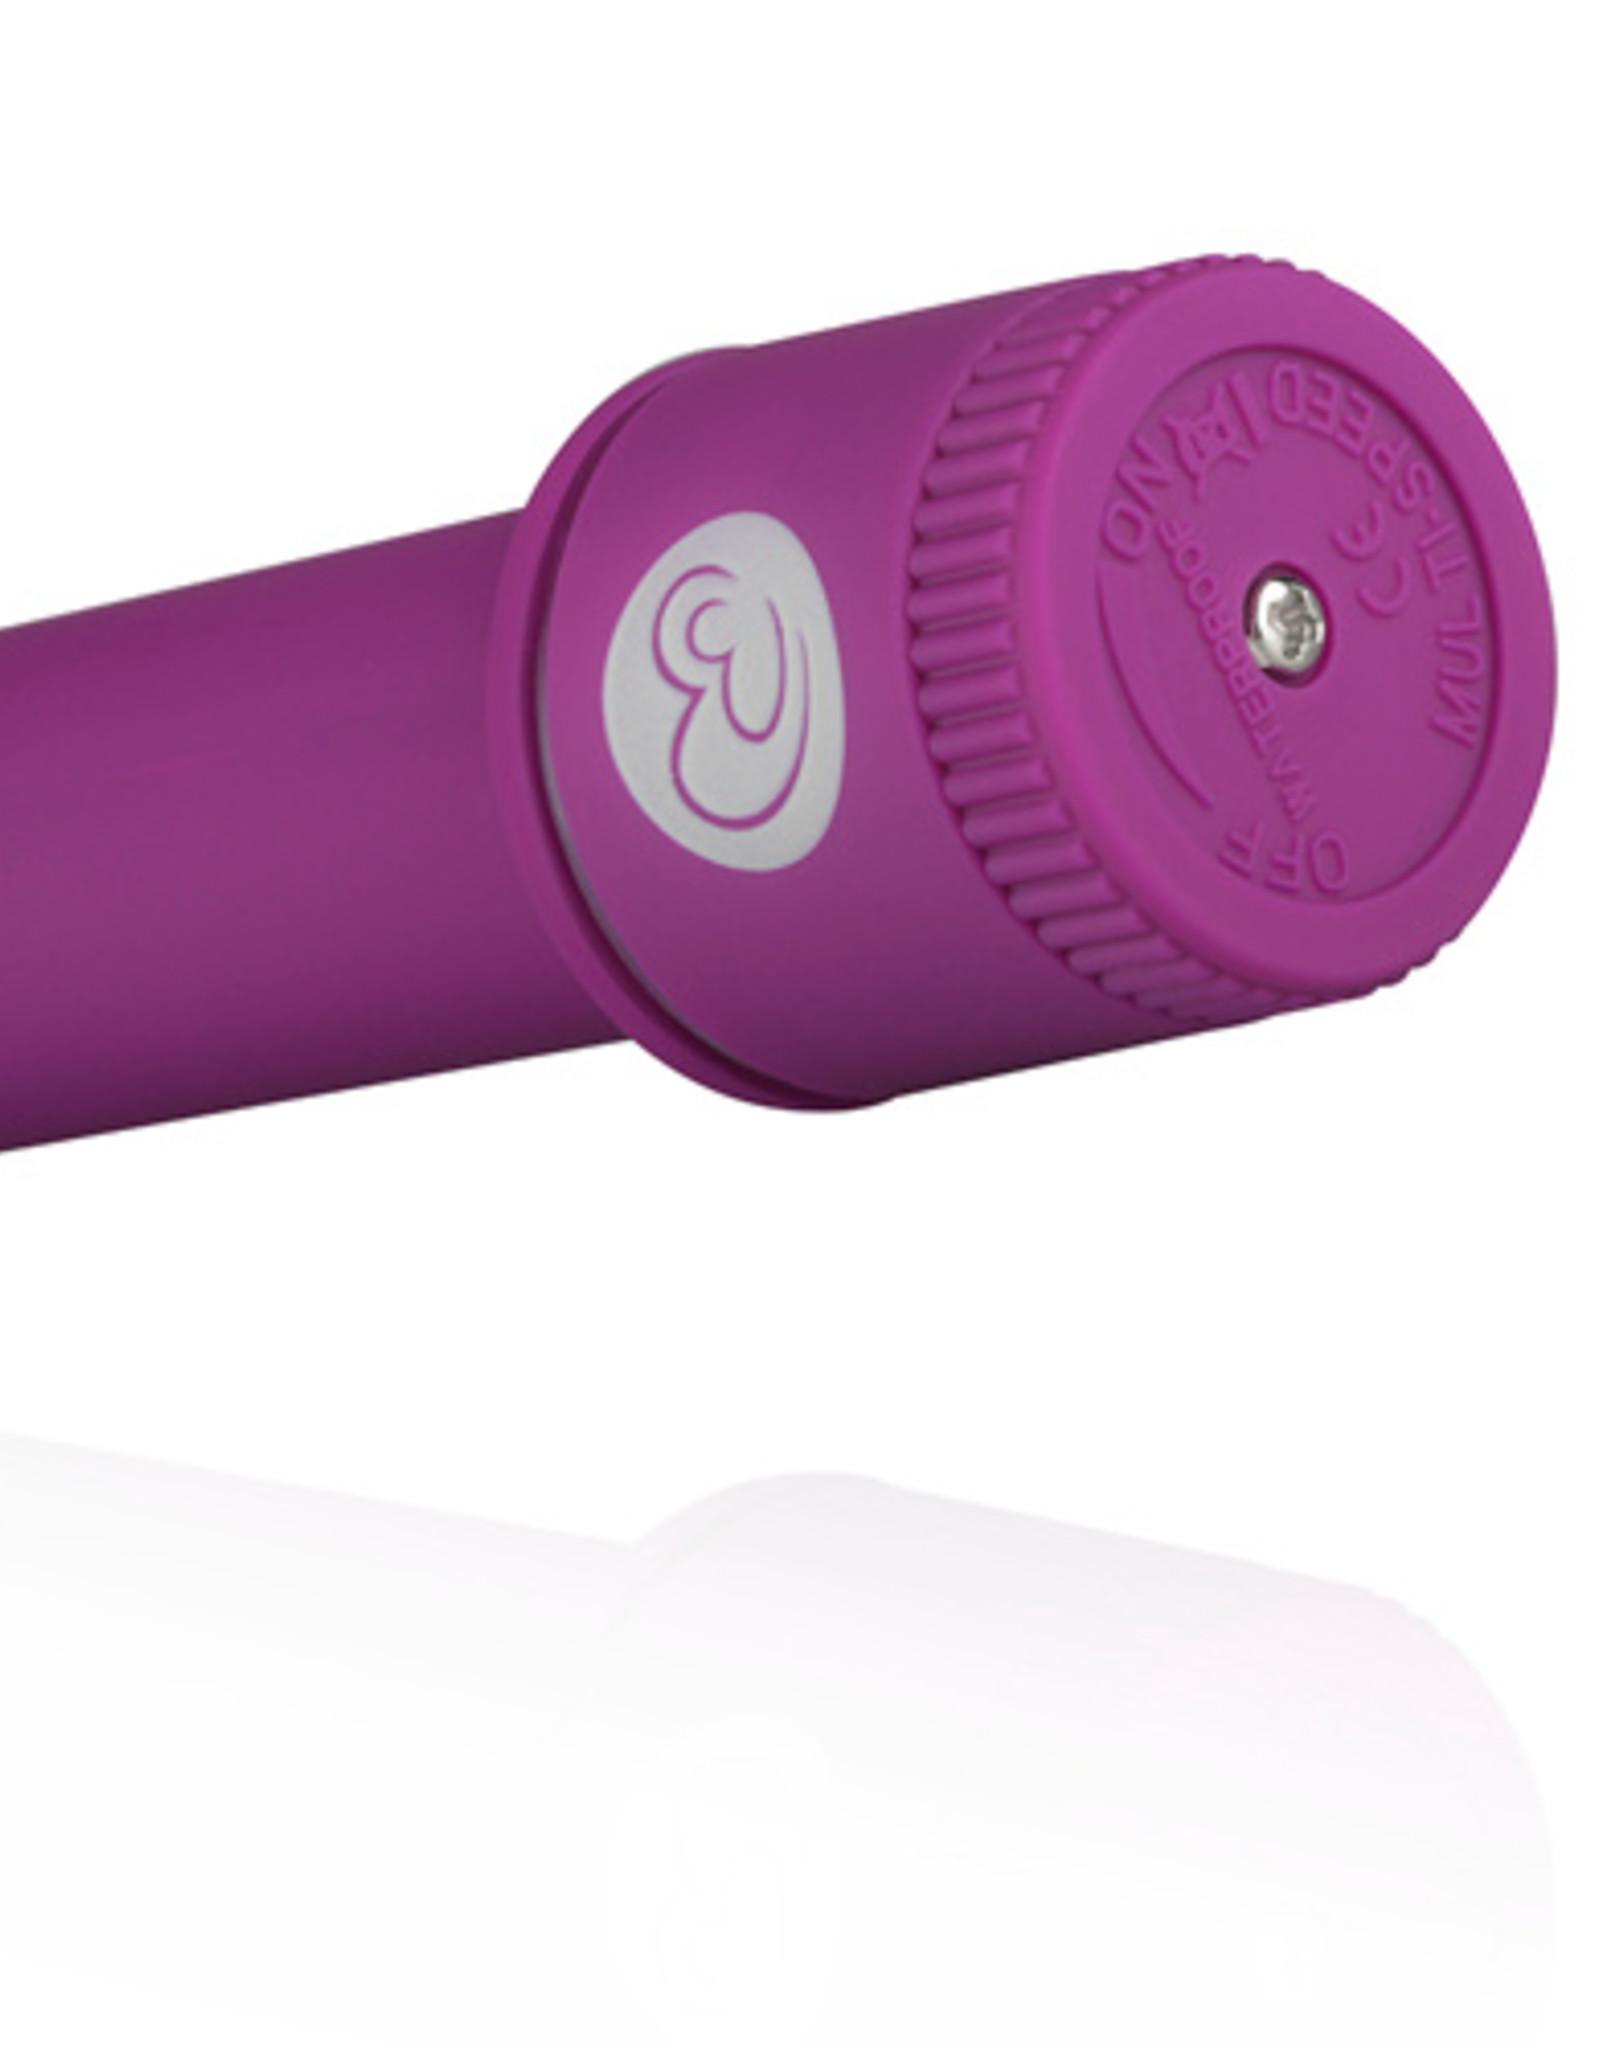 Easytoys Vibe Collection G-spot vibrator - paars